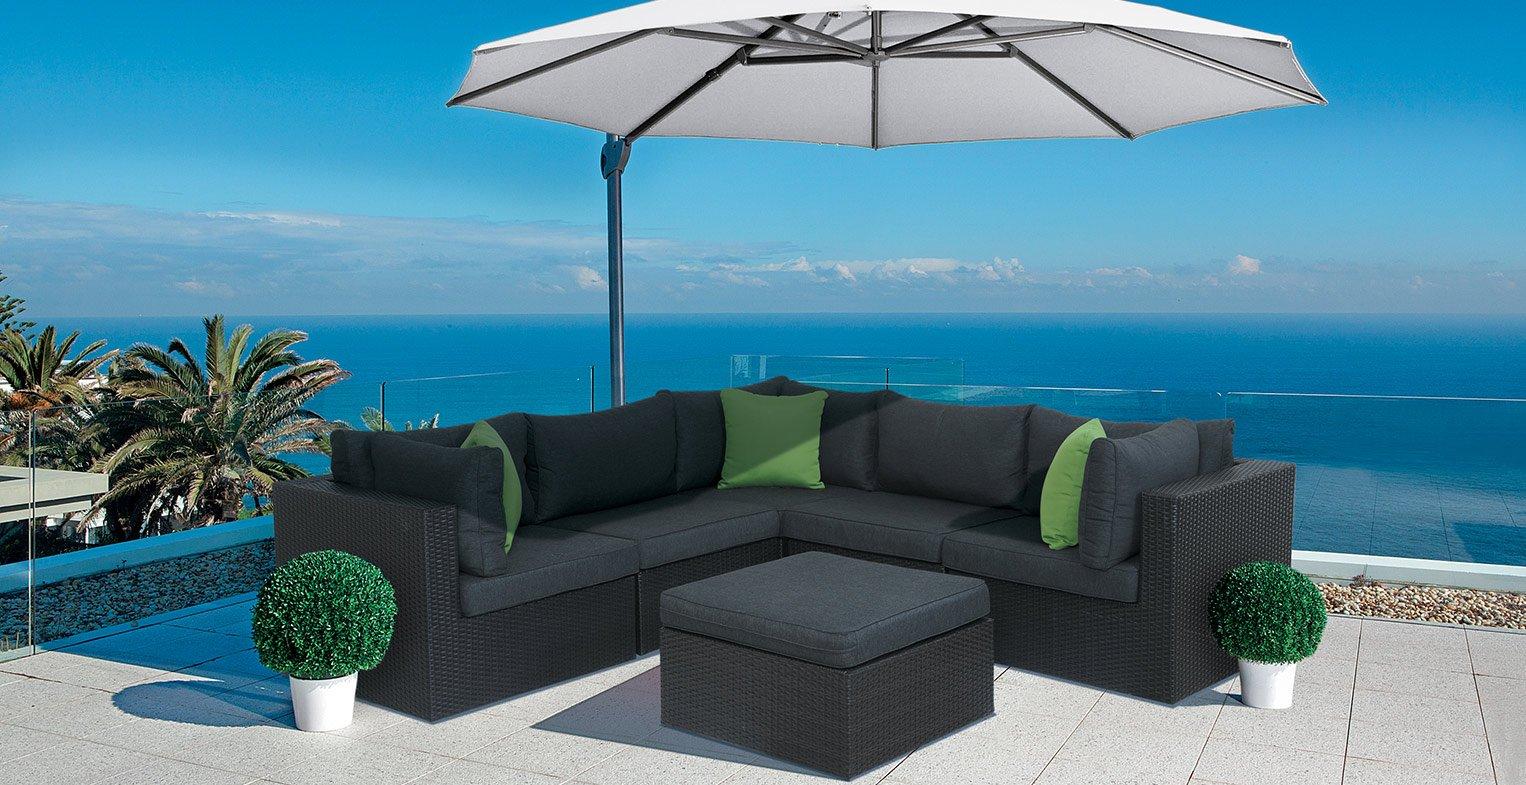 Outdoor Furniture Chairs Nz: Danske Møbler New Zealand Made Furniture, Stressless